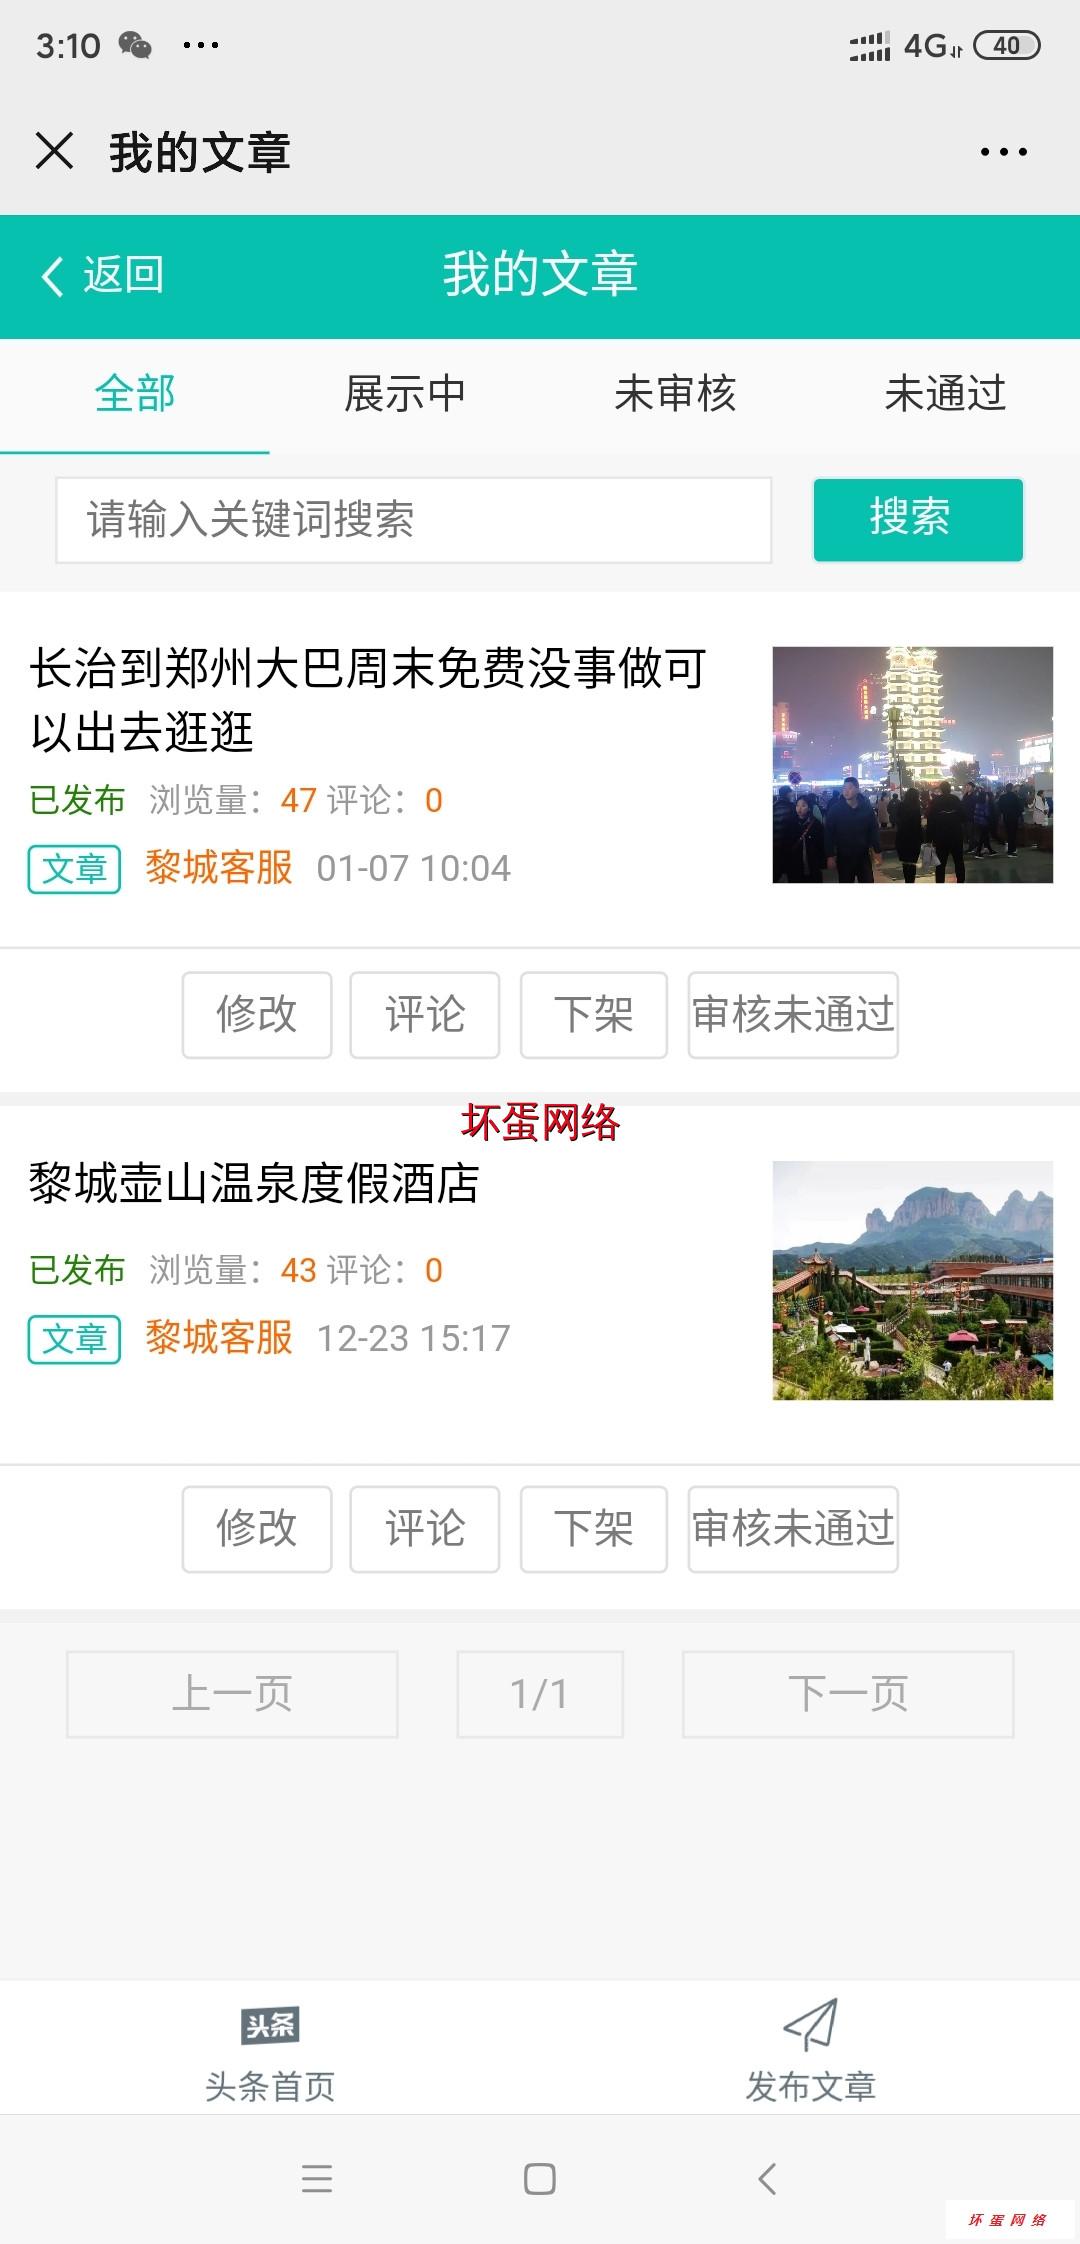 Screenshot_2020-01-21-15-10-56-605_com.tencent.mm.jpg